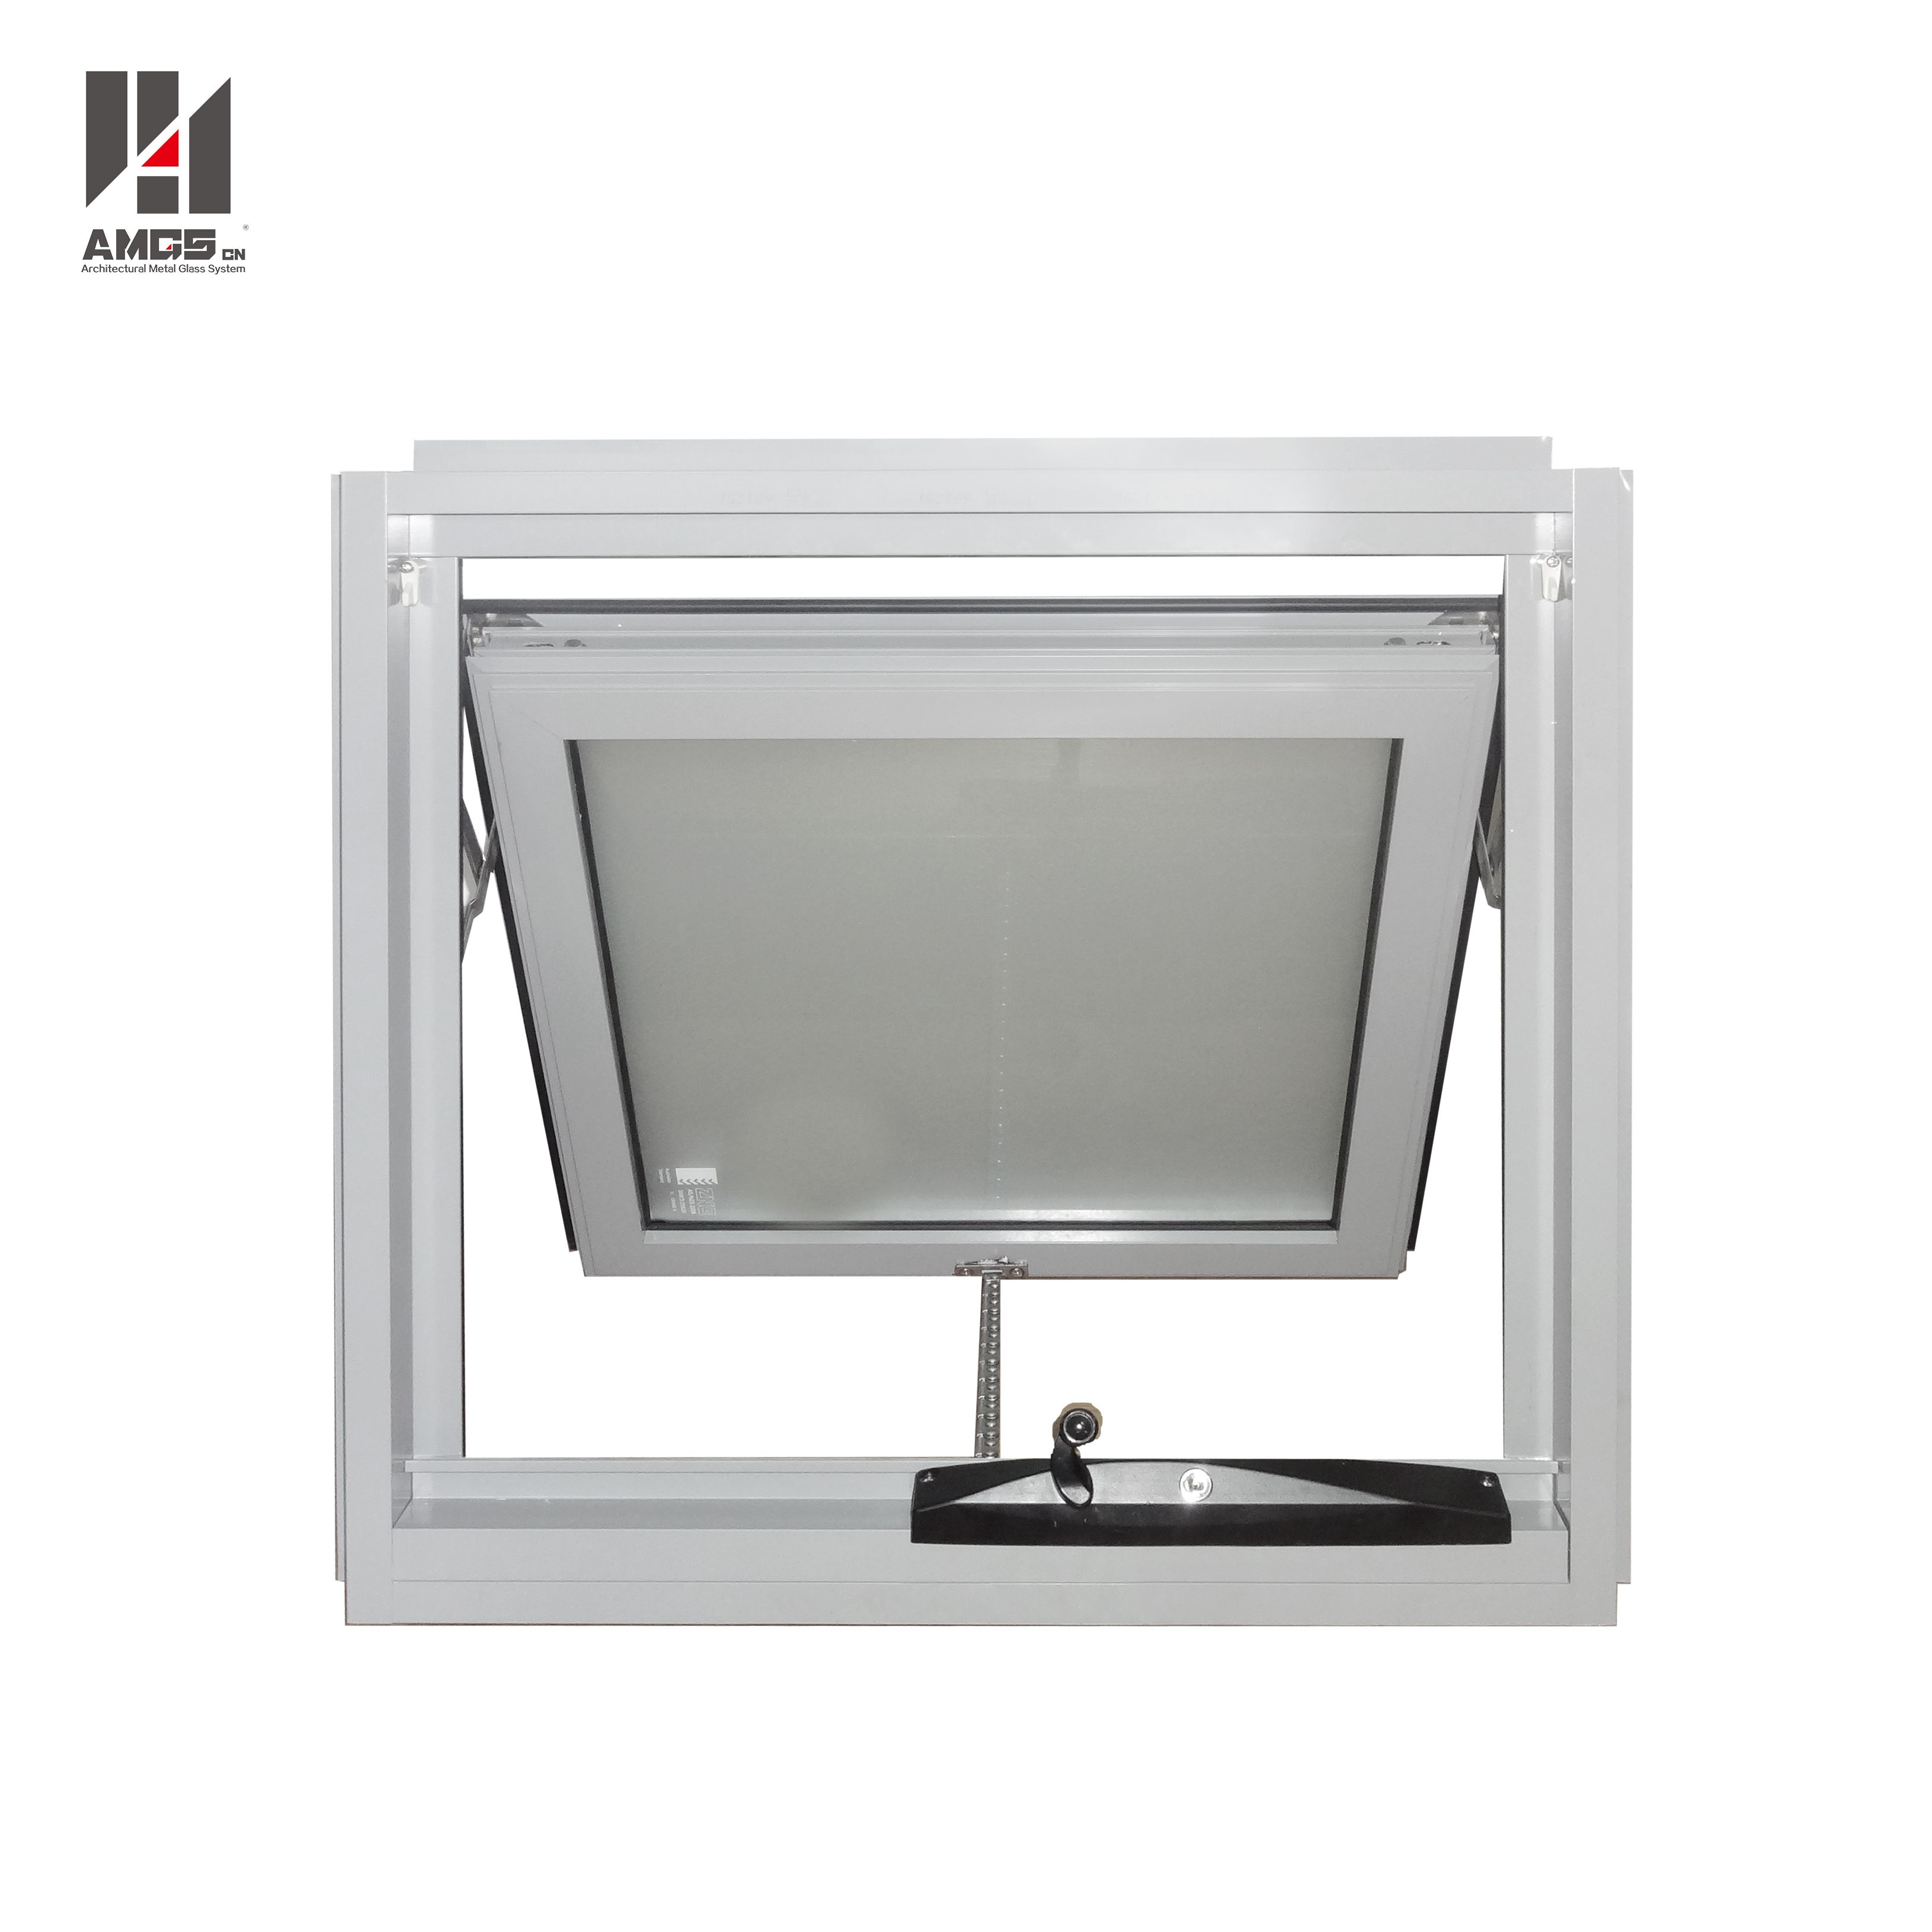 Toilet Waterproof Standard Vertical Chain Winder Aluminum Awning Window Buy Awning Window Aluminum Awning Window Powder Coating Aluminum Awning Wind